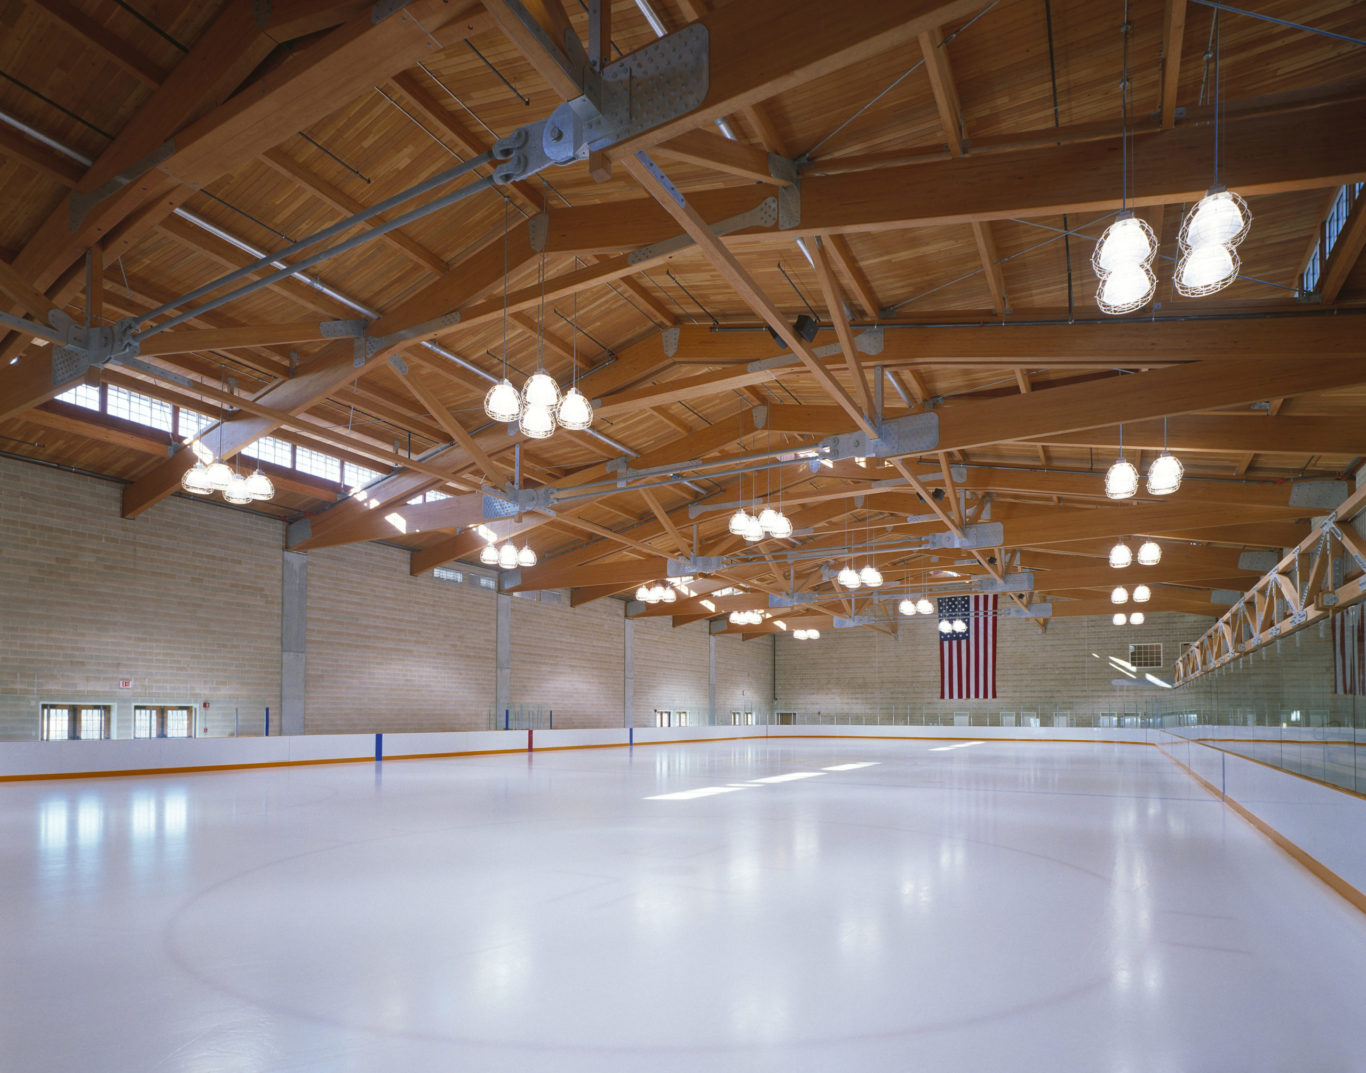 Slide 6 of 7, Brunswick School – Athletic Center